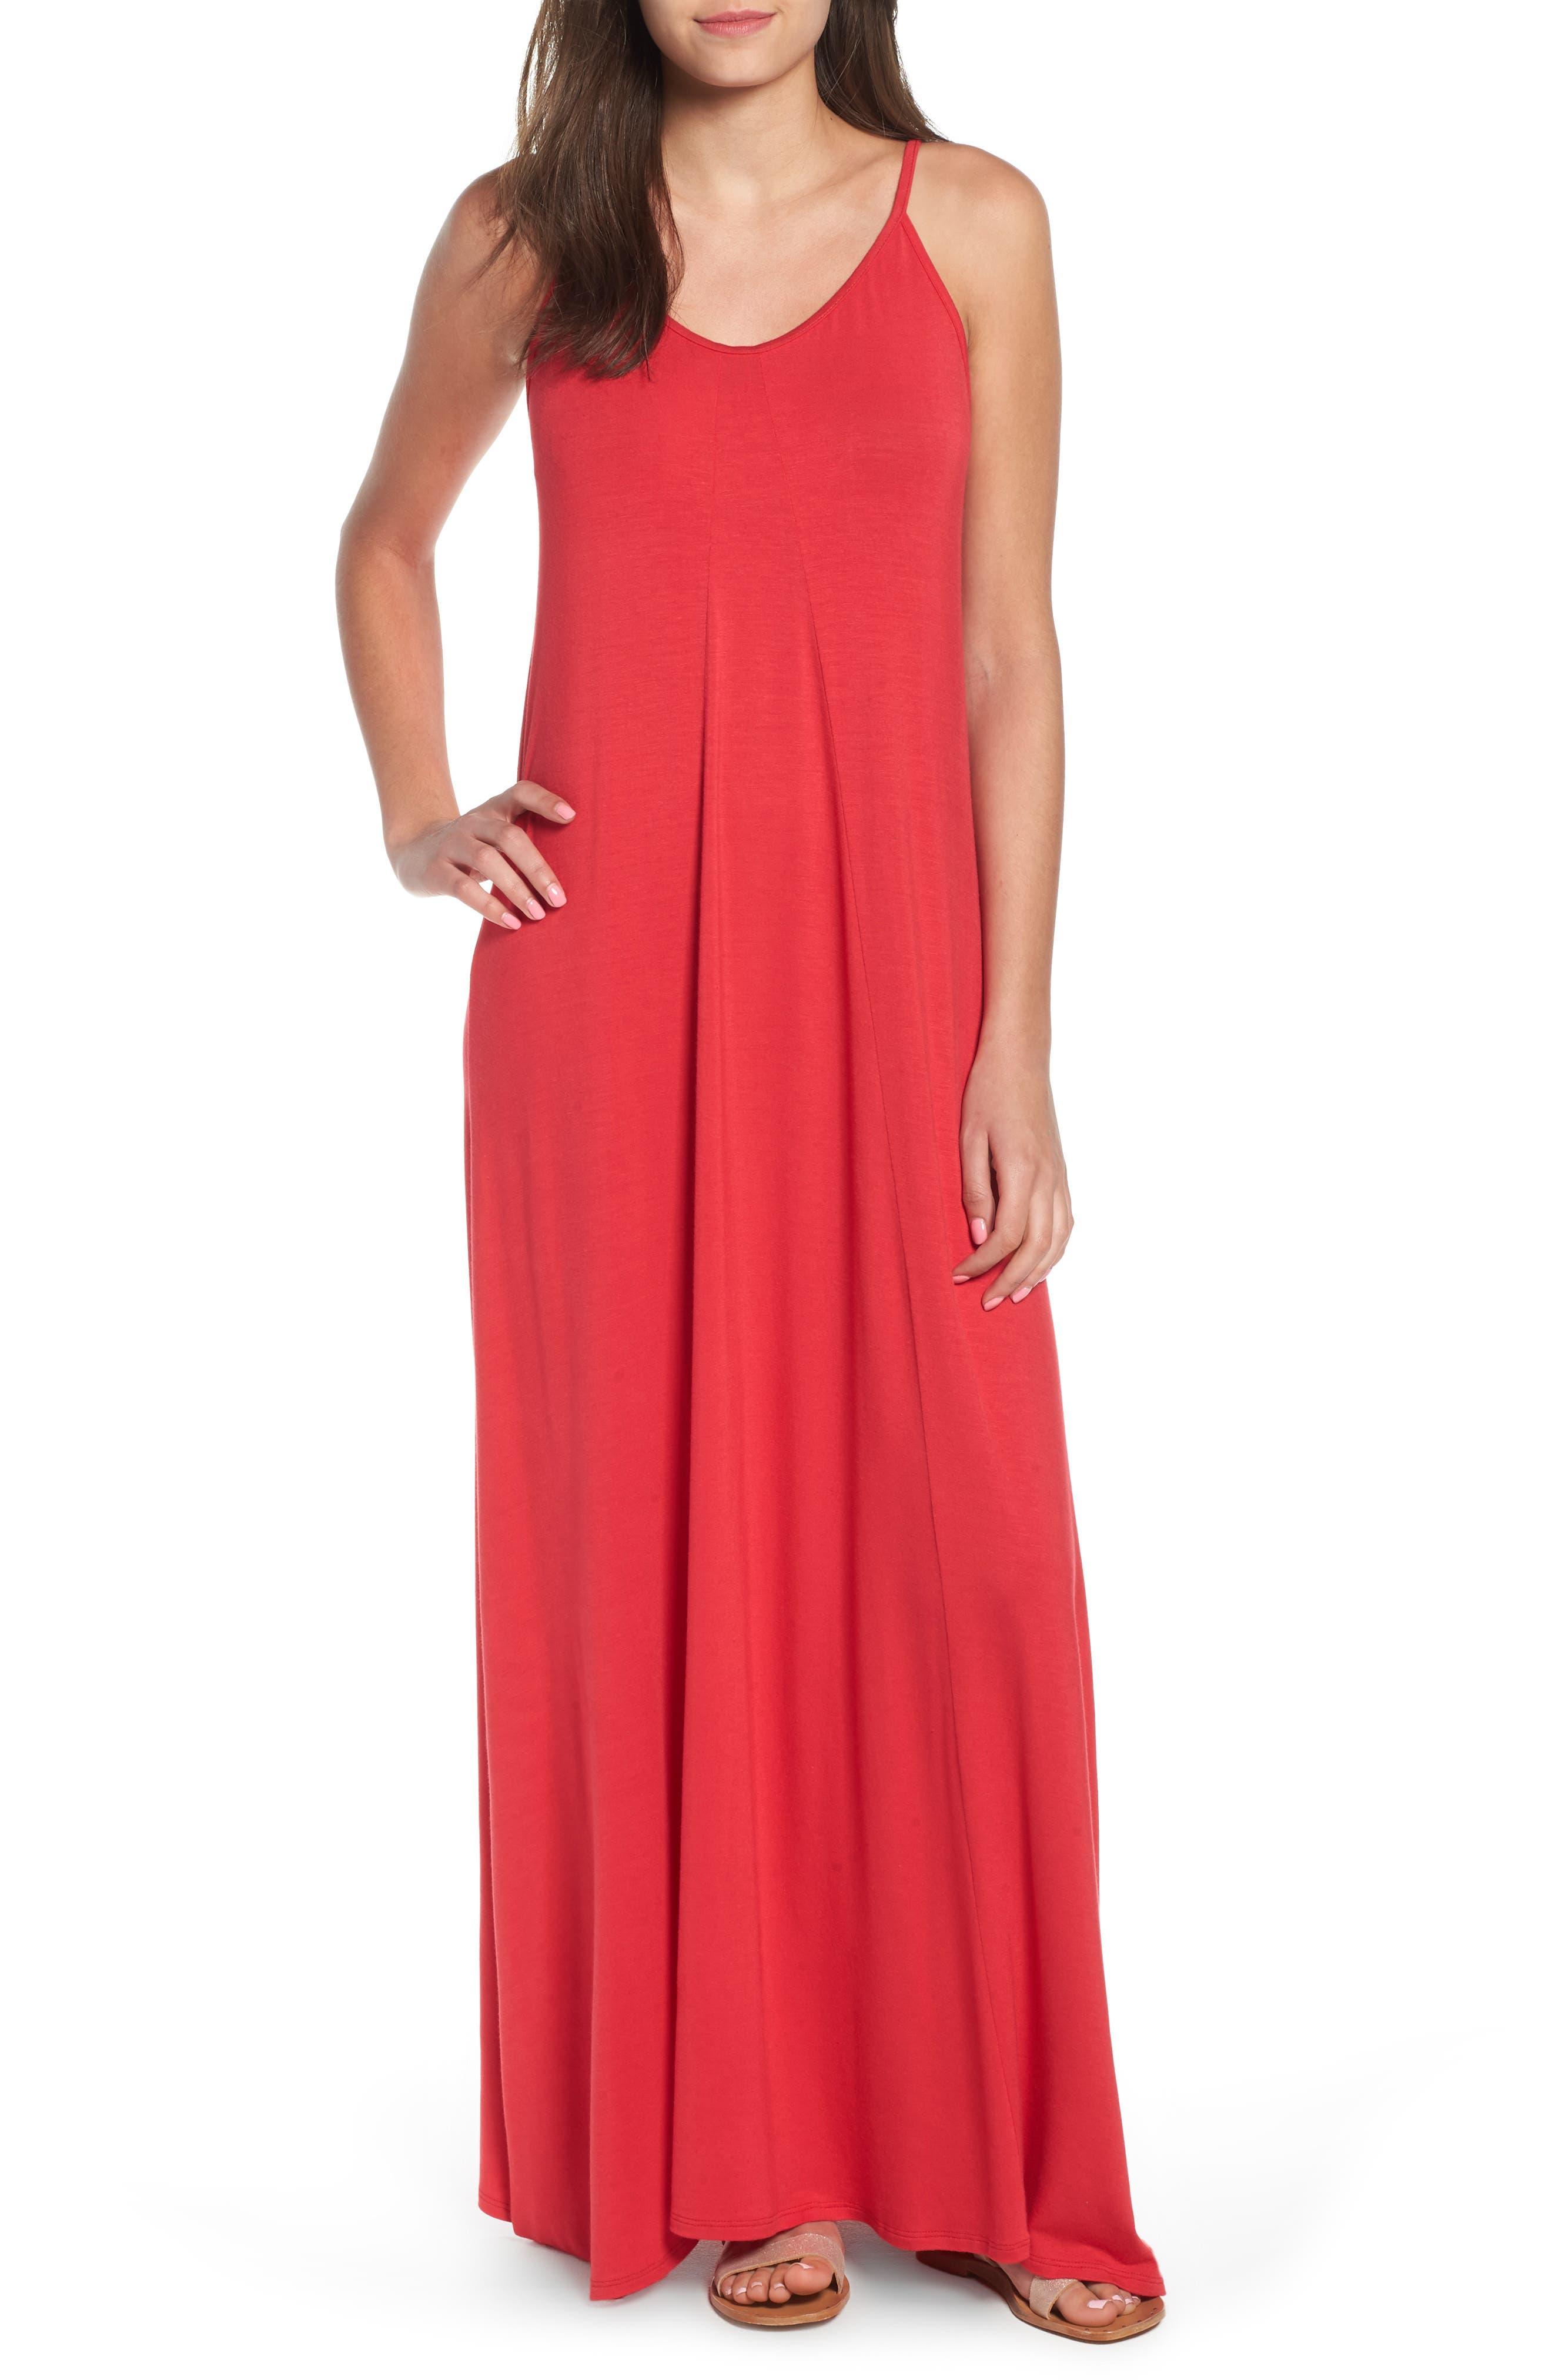 6cc57b9dfa39 Women s Vacation Dresses